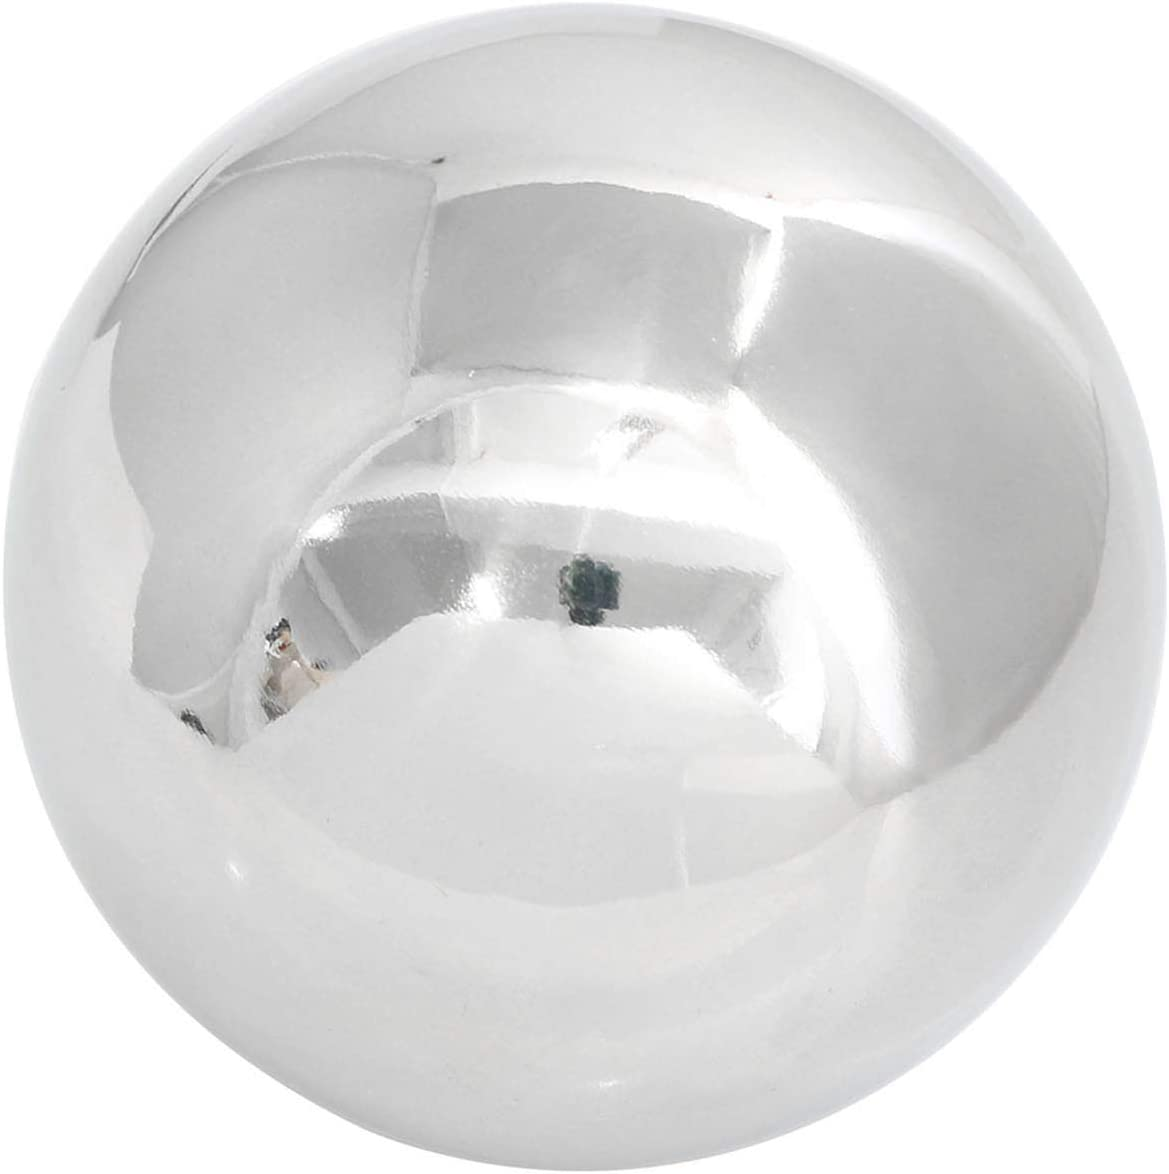 ZYAMY 4 Inch Stainless Steel Ball Sphere Mirror Hollow Ball Home Garden Decoration Supplies